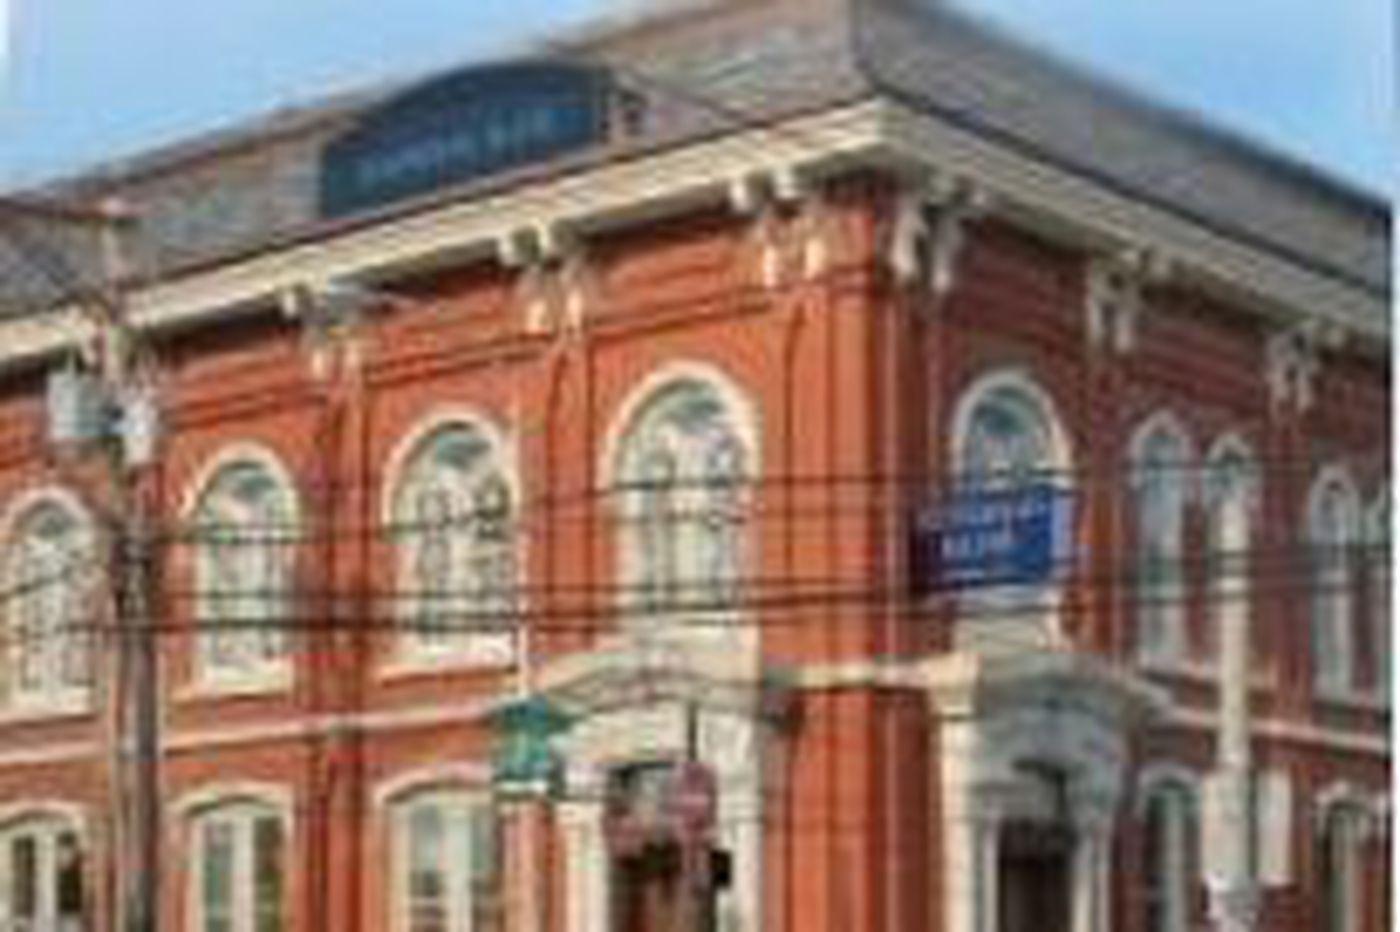 Hyperion raises $18 million, plans more Philly business loans